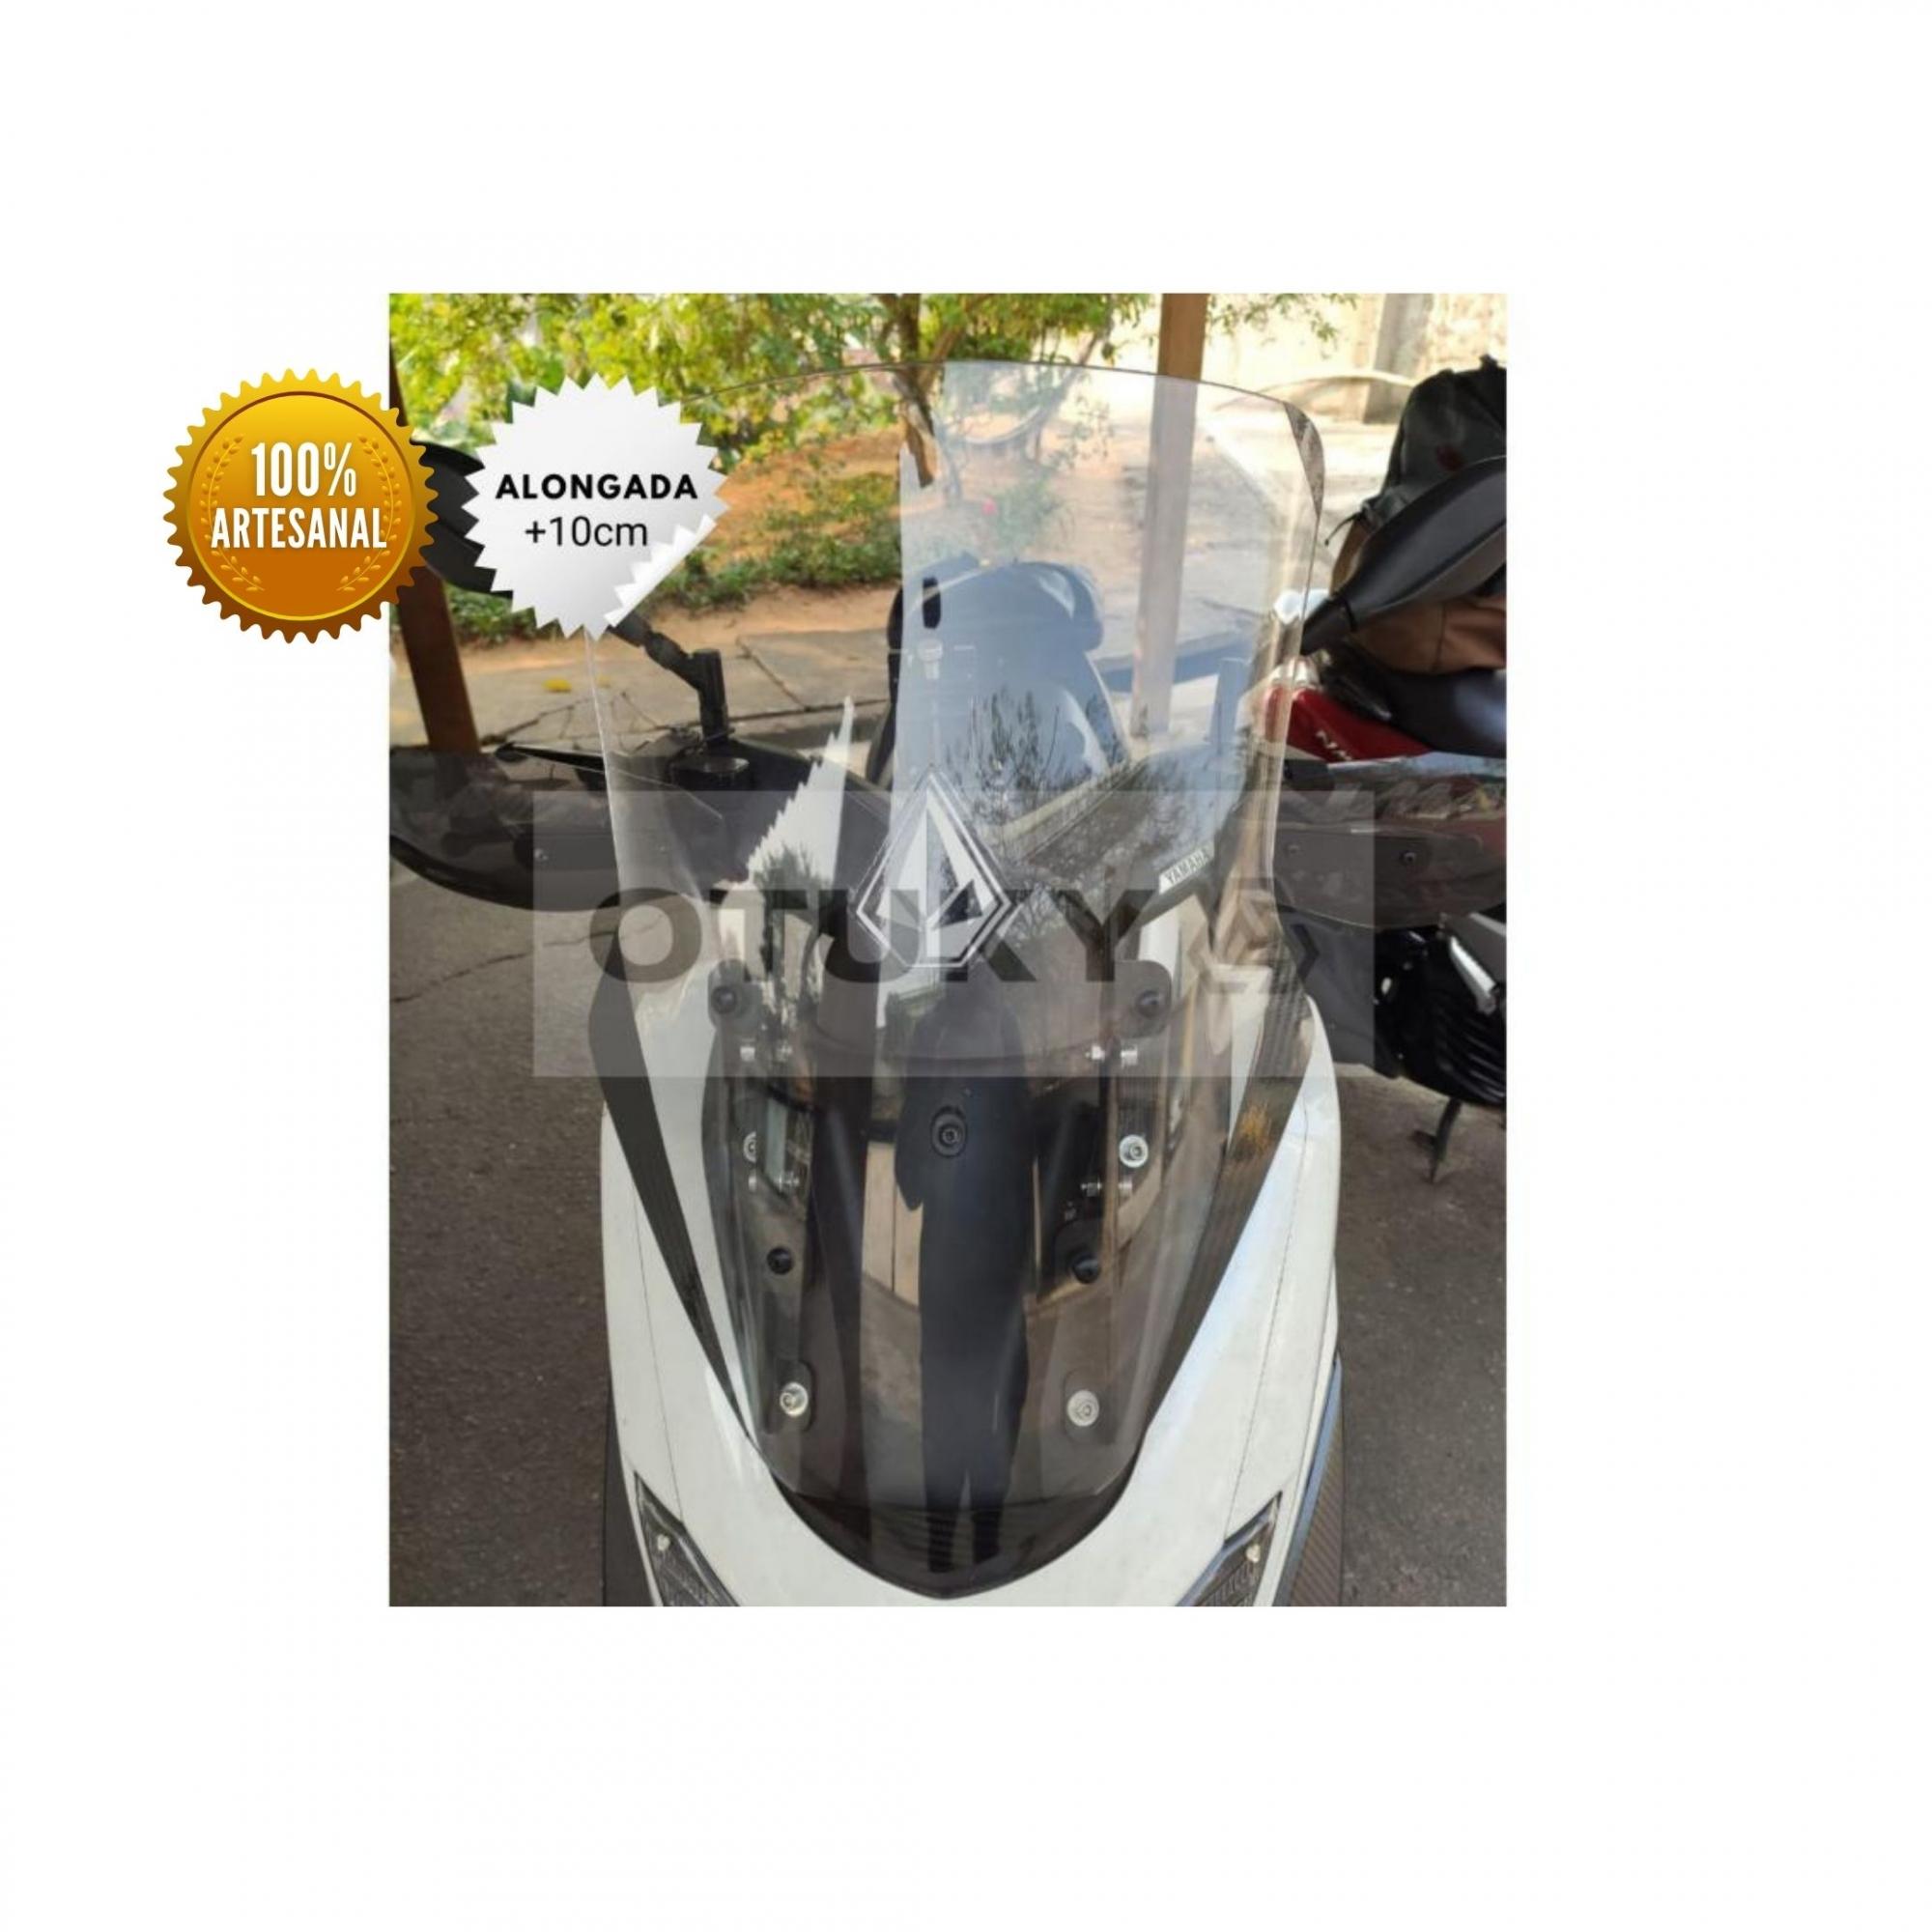 Bolha para Moto Nmax 160 2017 2018 2019 2020 Otuky Alongada Cristal